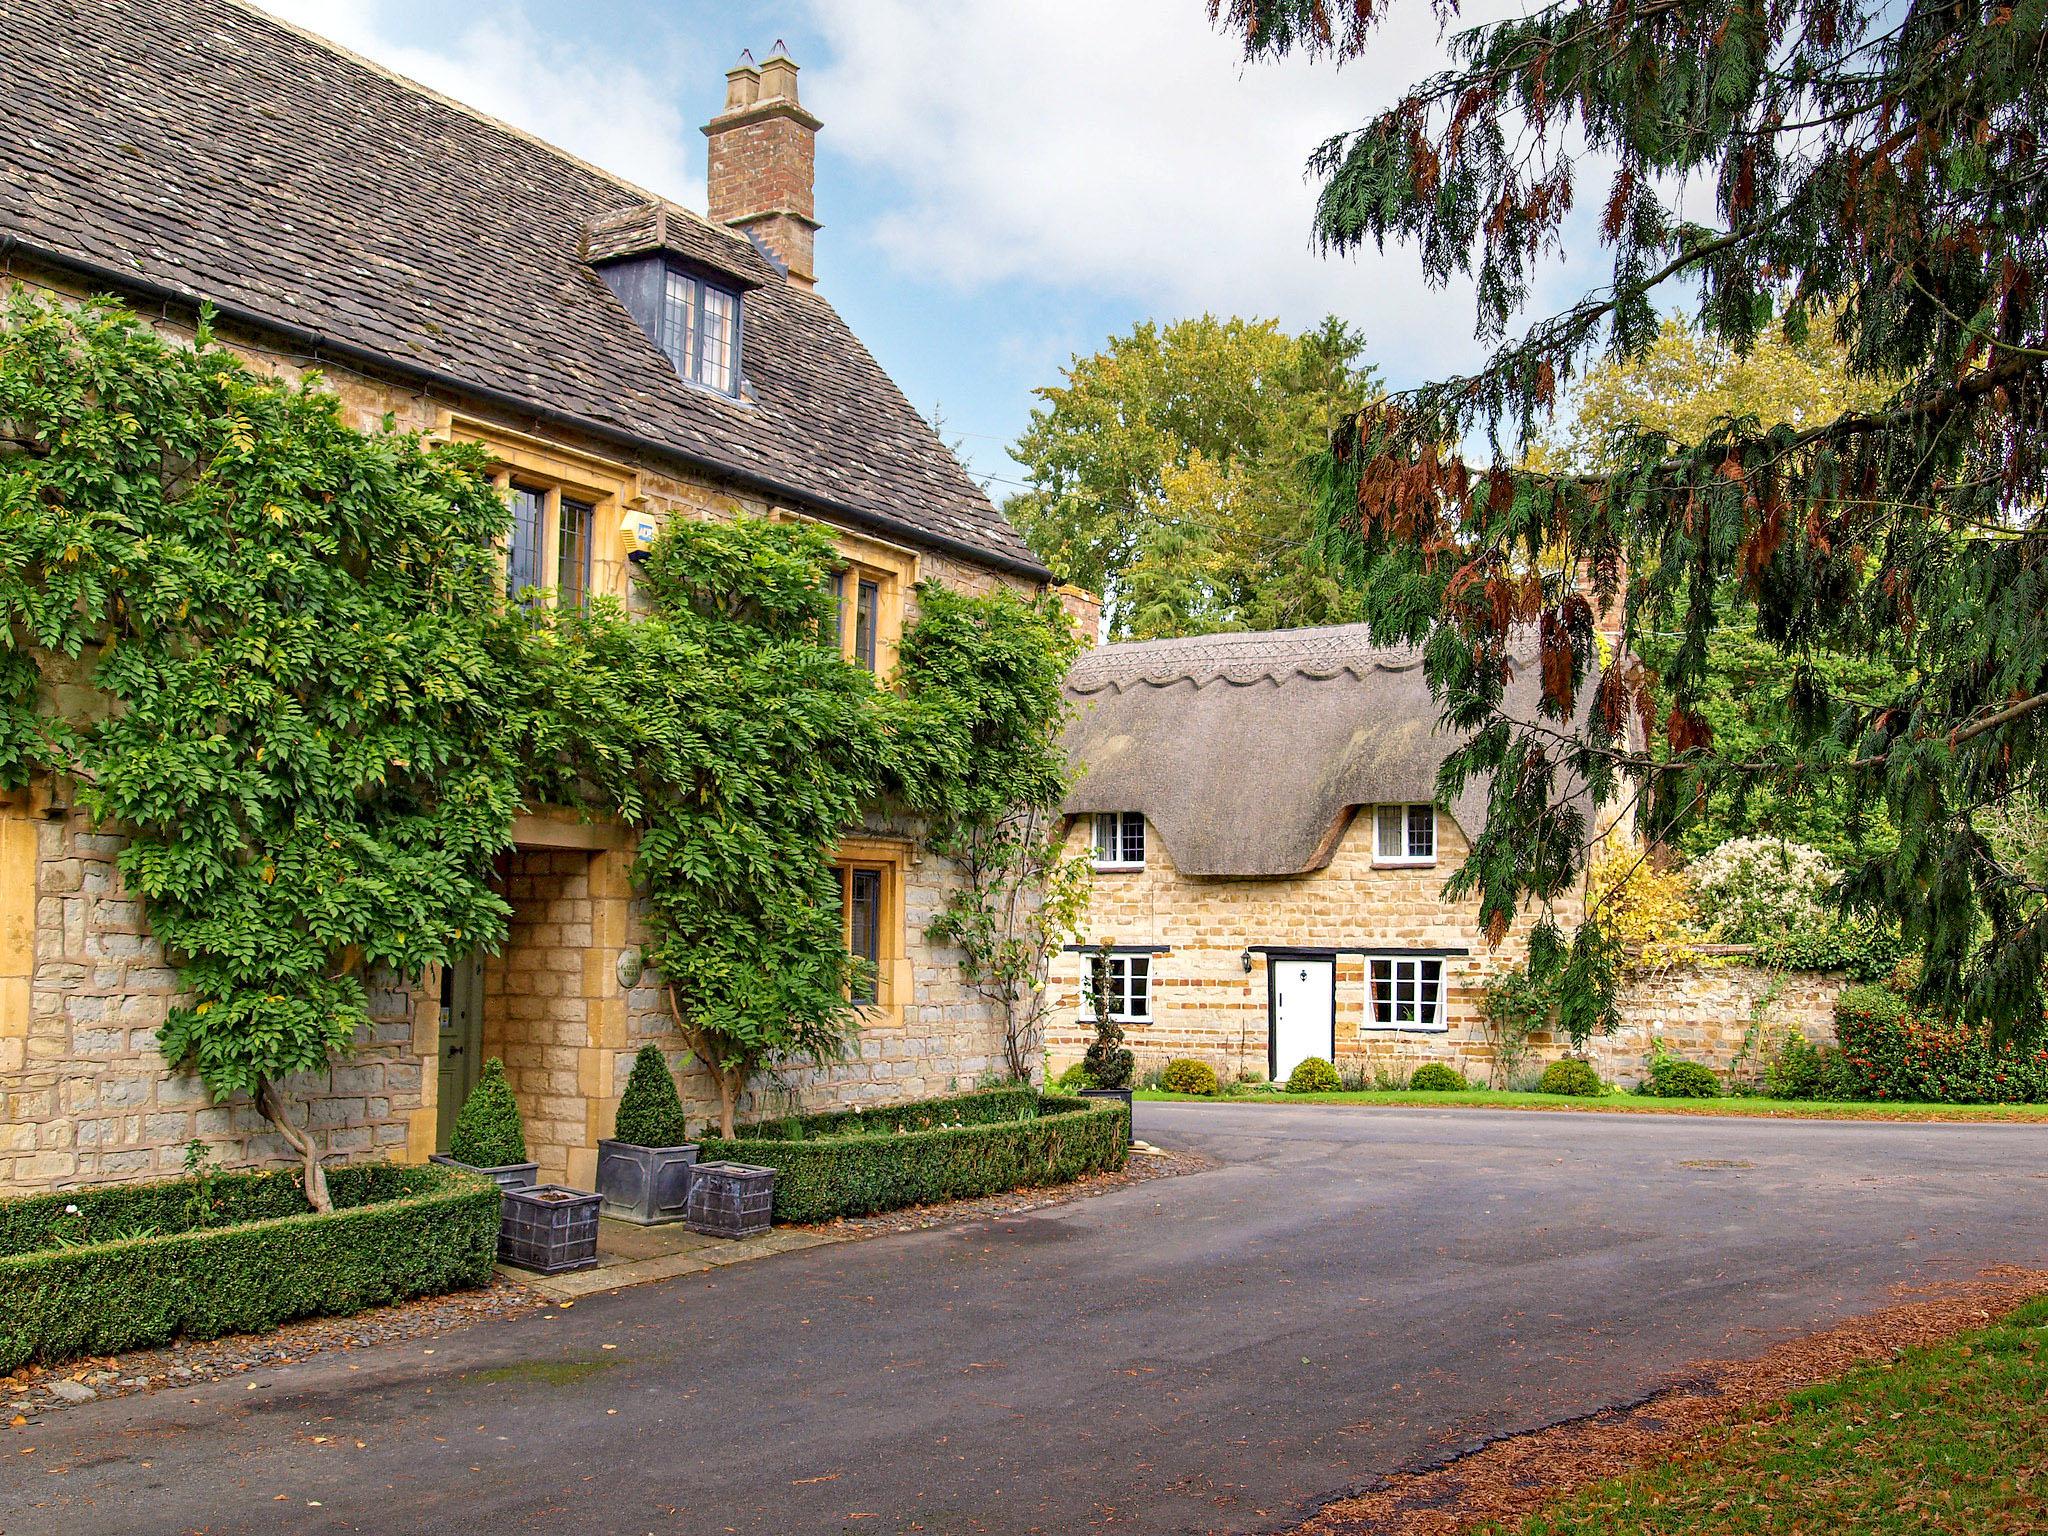 A shady corner of quiet Honington, Warwickshire by Andrew S Brown.jpg